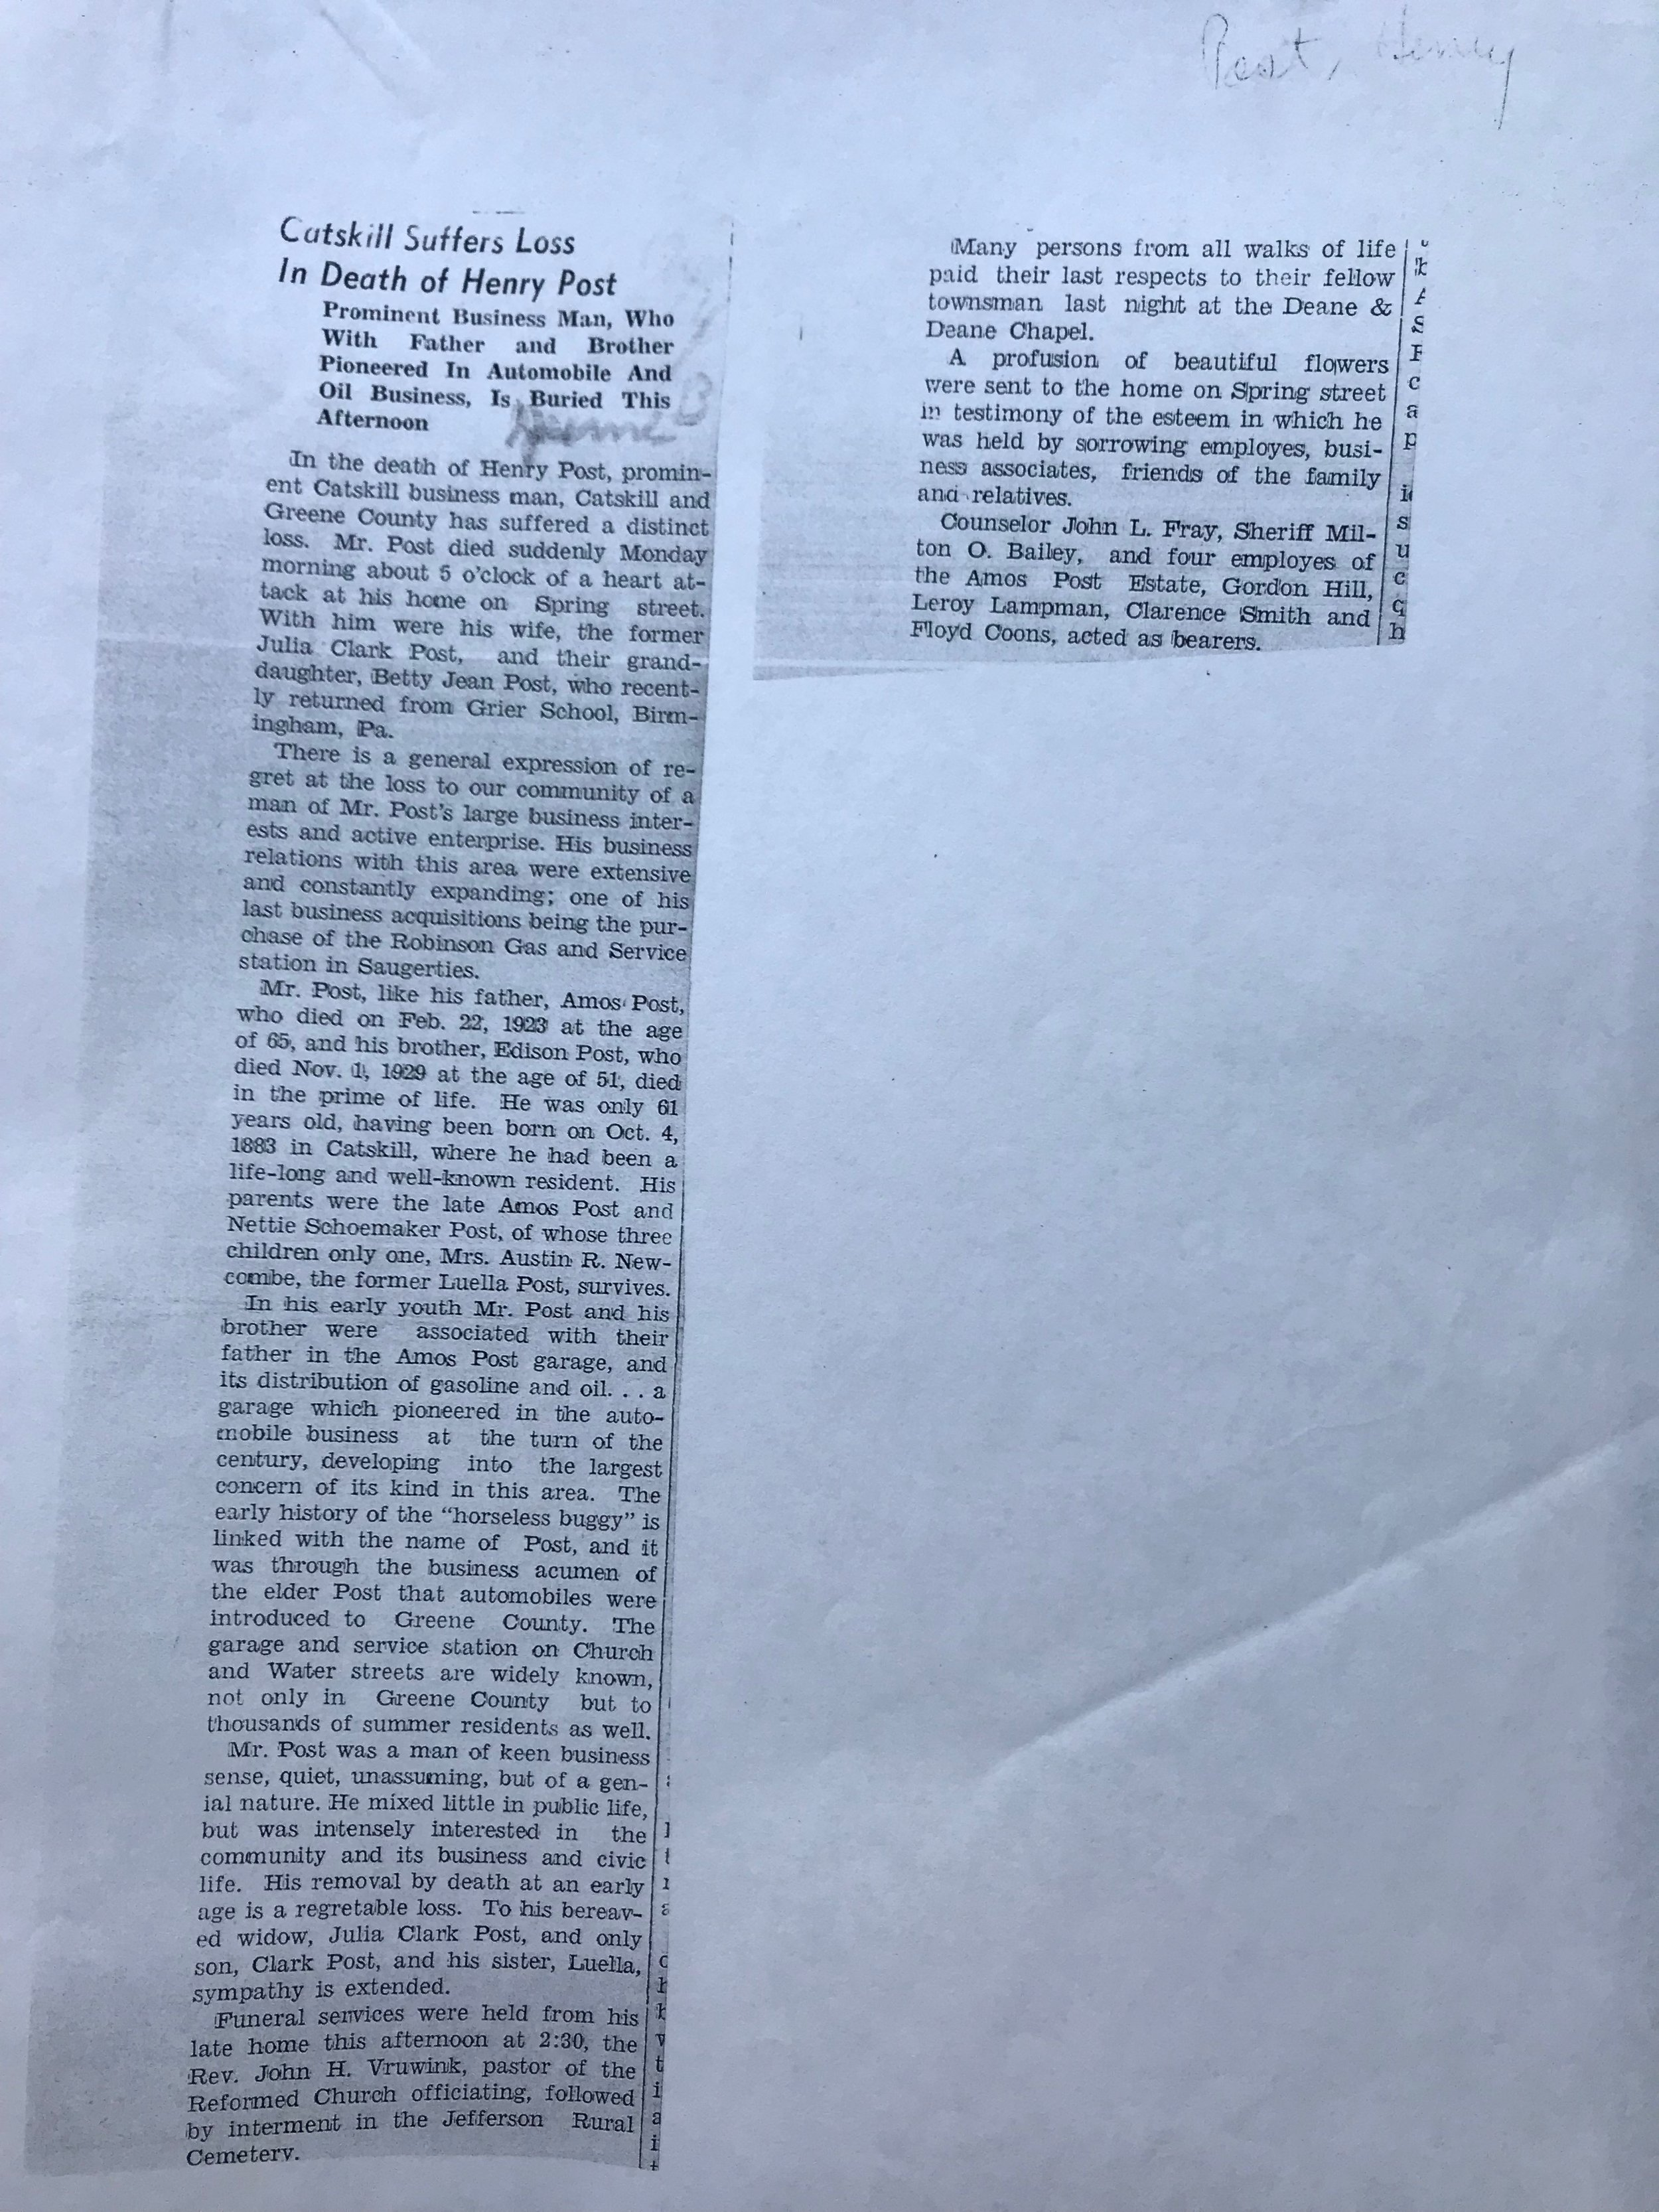 Henry Post's Obituary